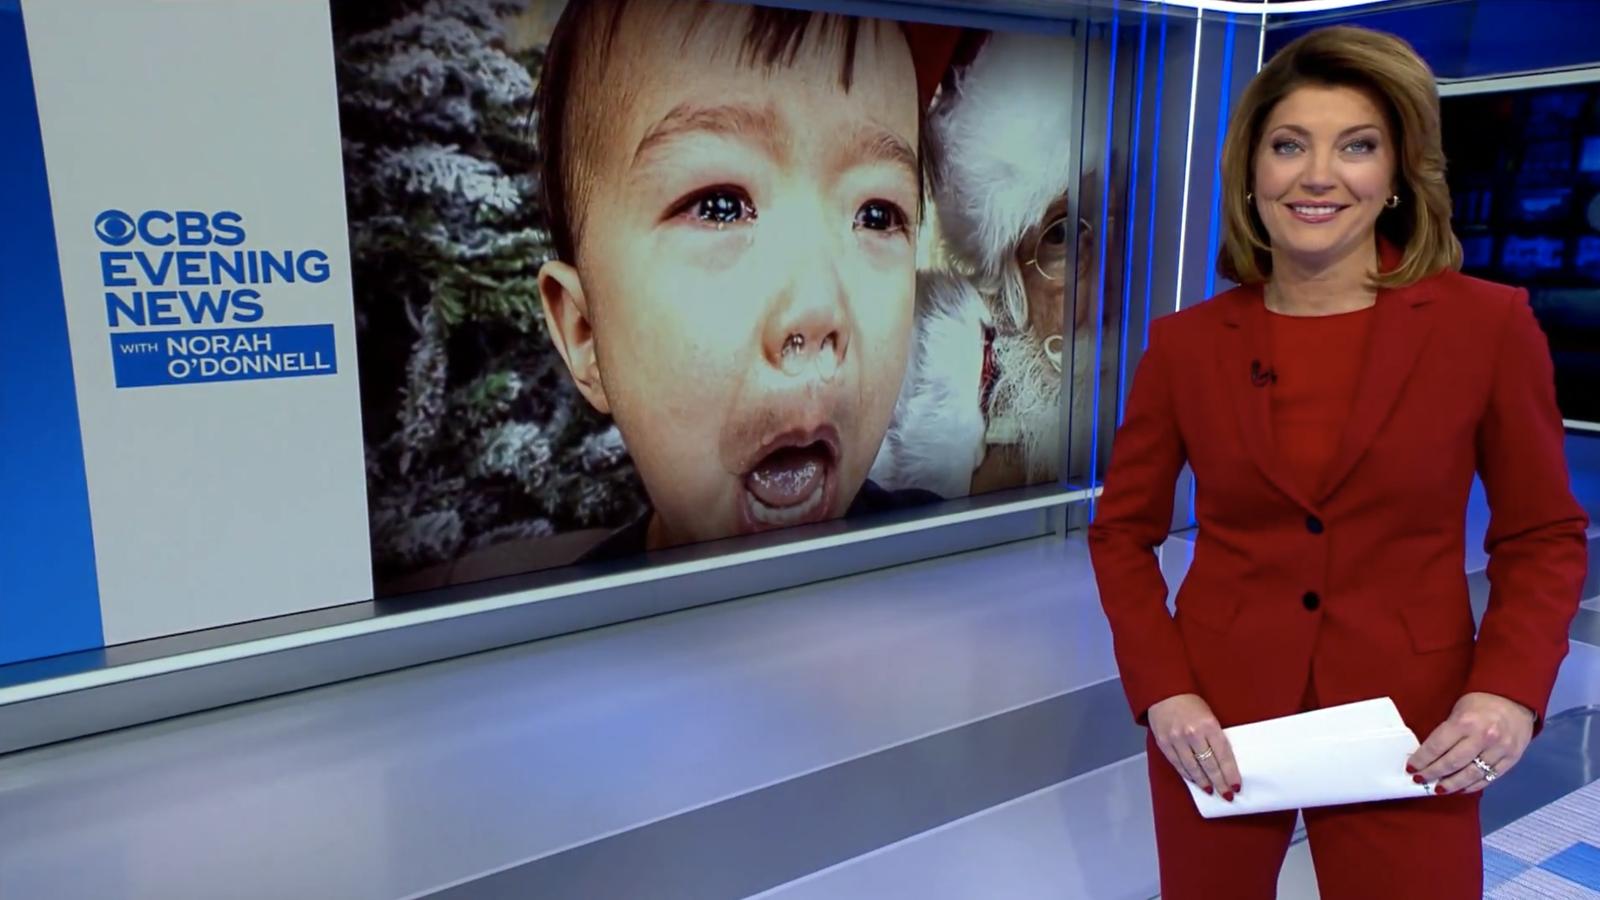 NCS_CBS-News-Washington-Bureau_STUDIO-2019_0008